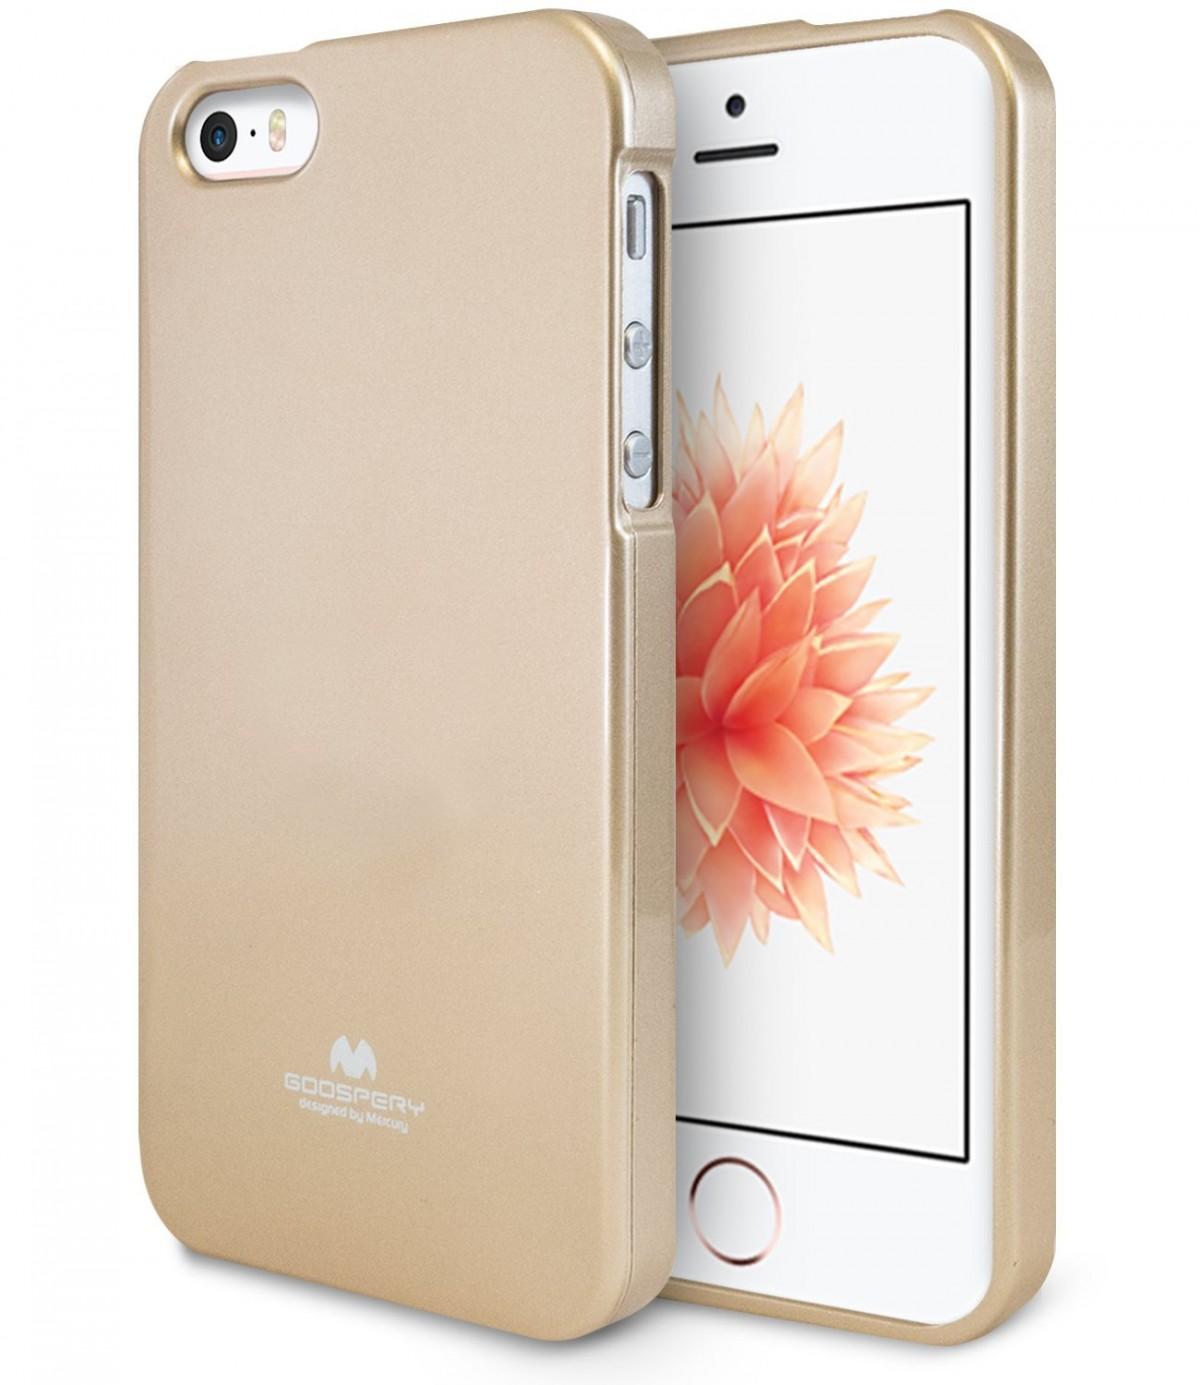 Silikonové obaly / kryty Goospery Mercury pro Apple iPhone SE / 5s / 5c / 5 - iJelly Metal - Zlatý / Gold